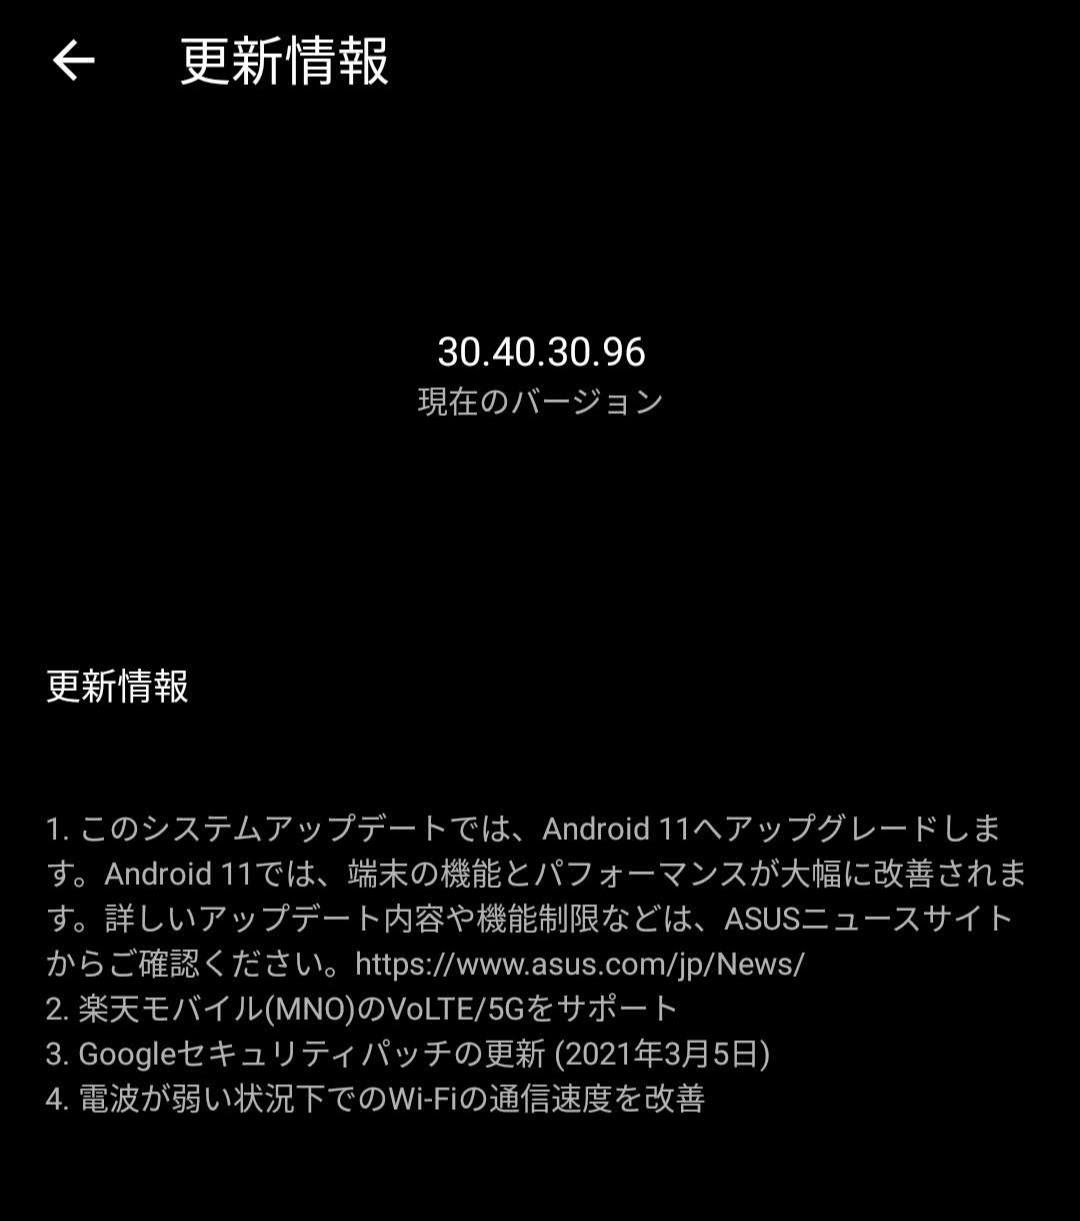 ASUS ZenFone 7 楽天モバイルに対応 1